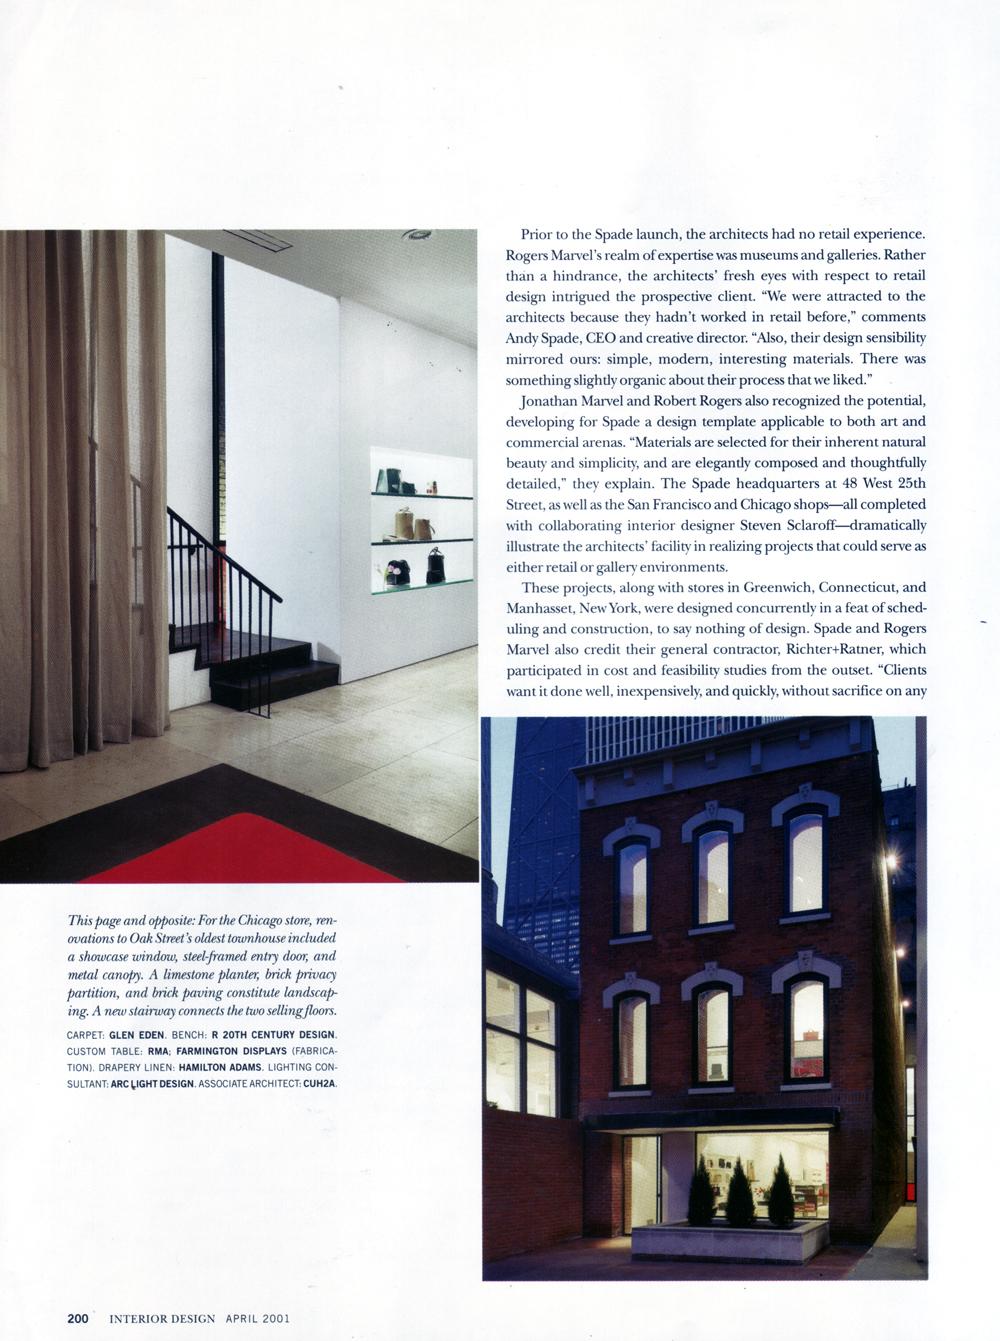 steven sclaroff | interior design magazine: kate spade stores